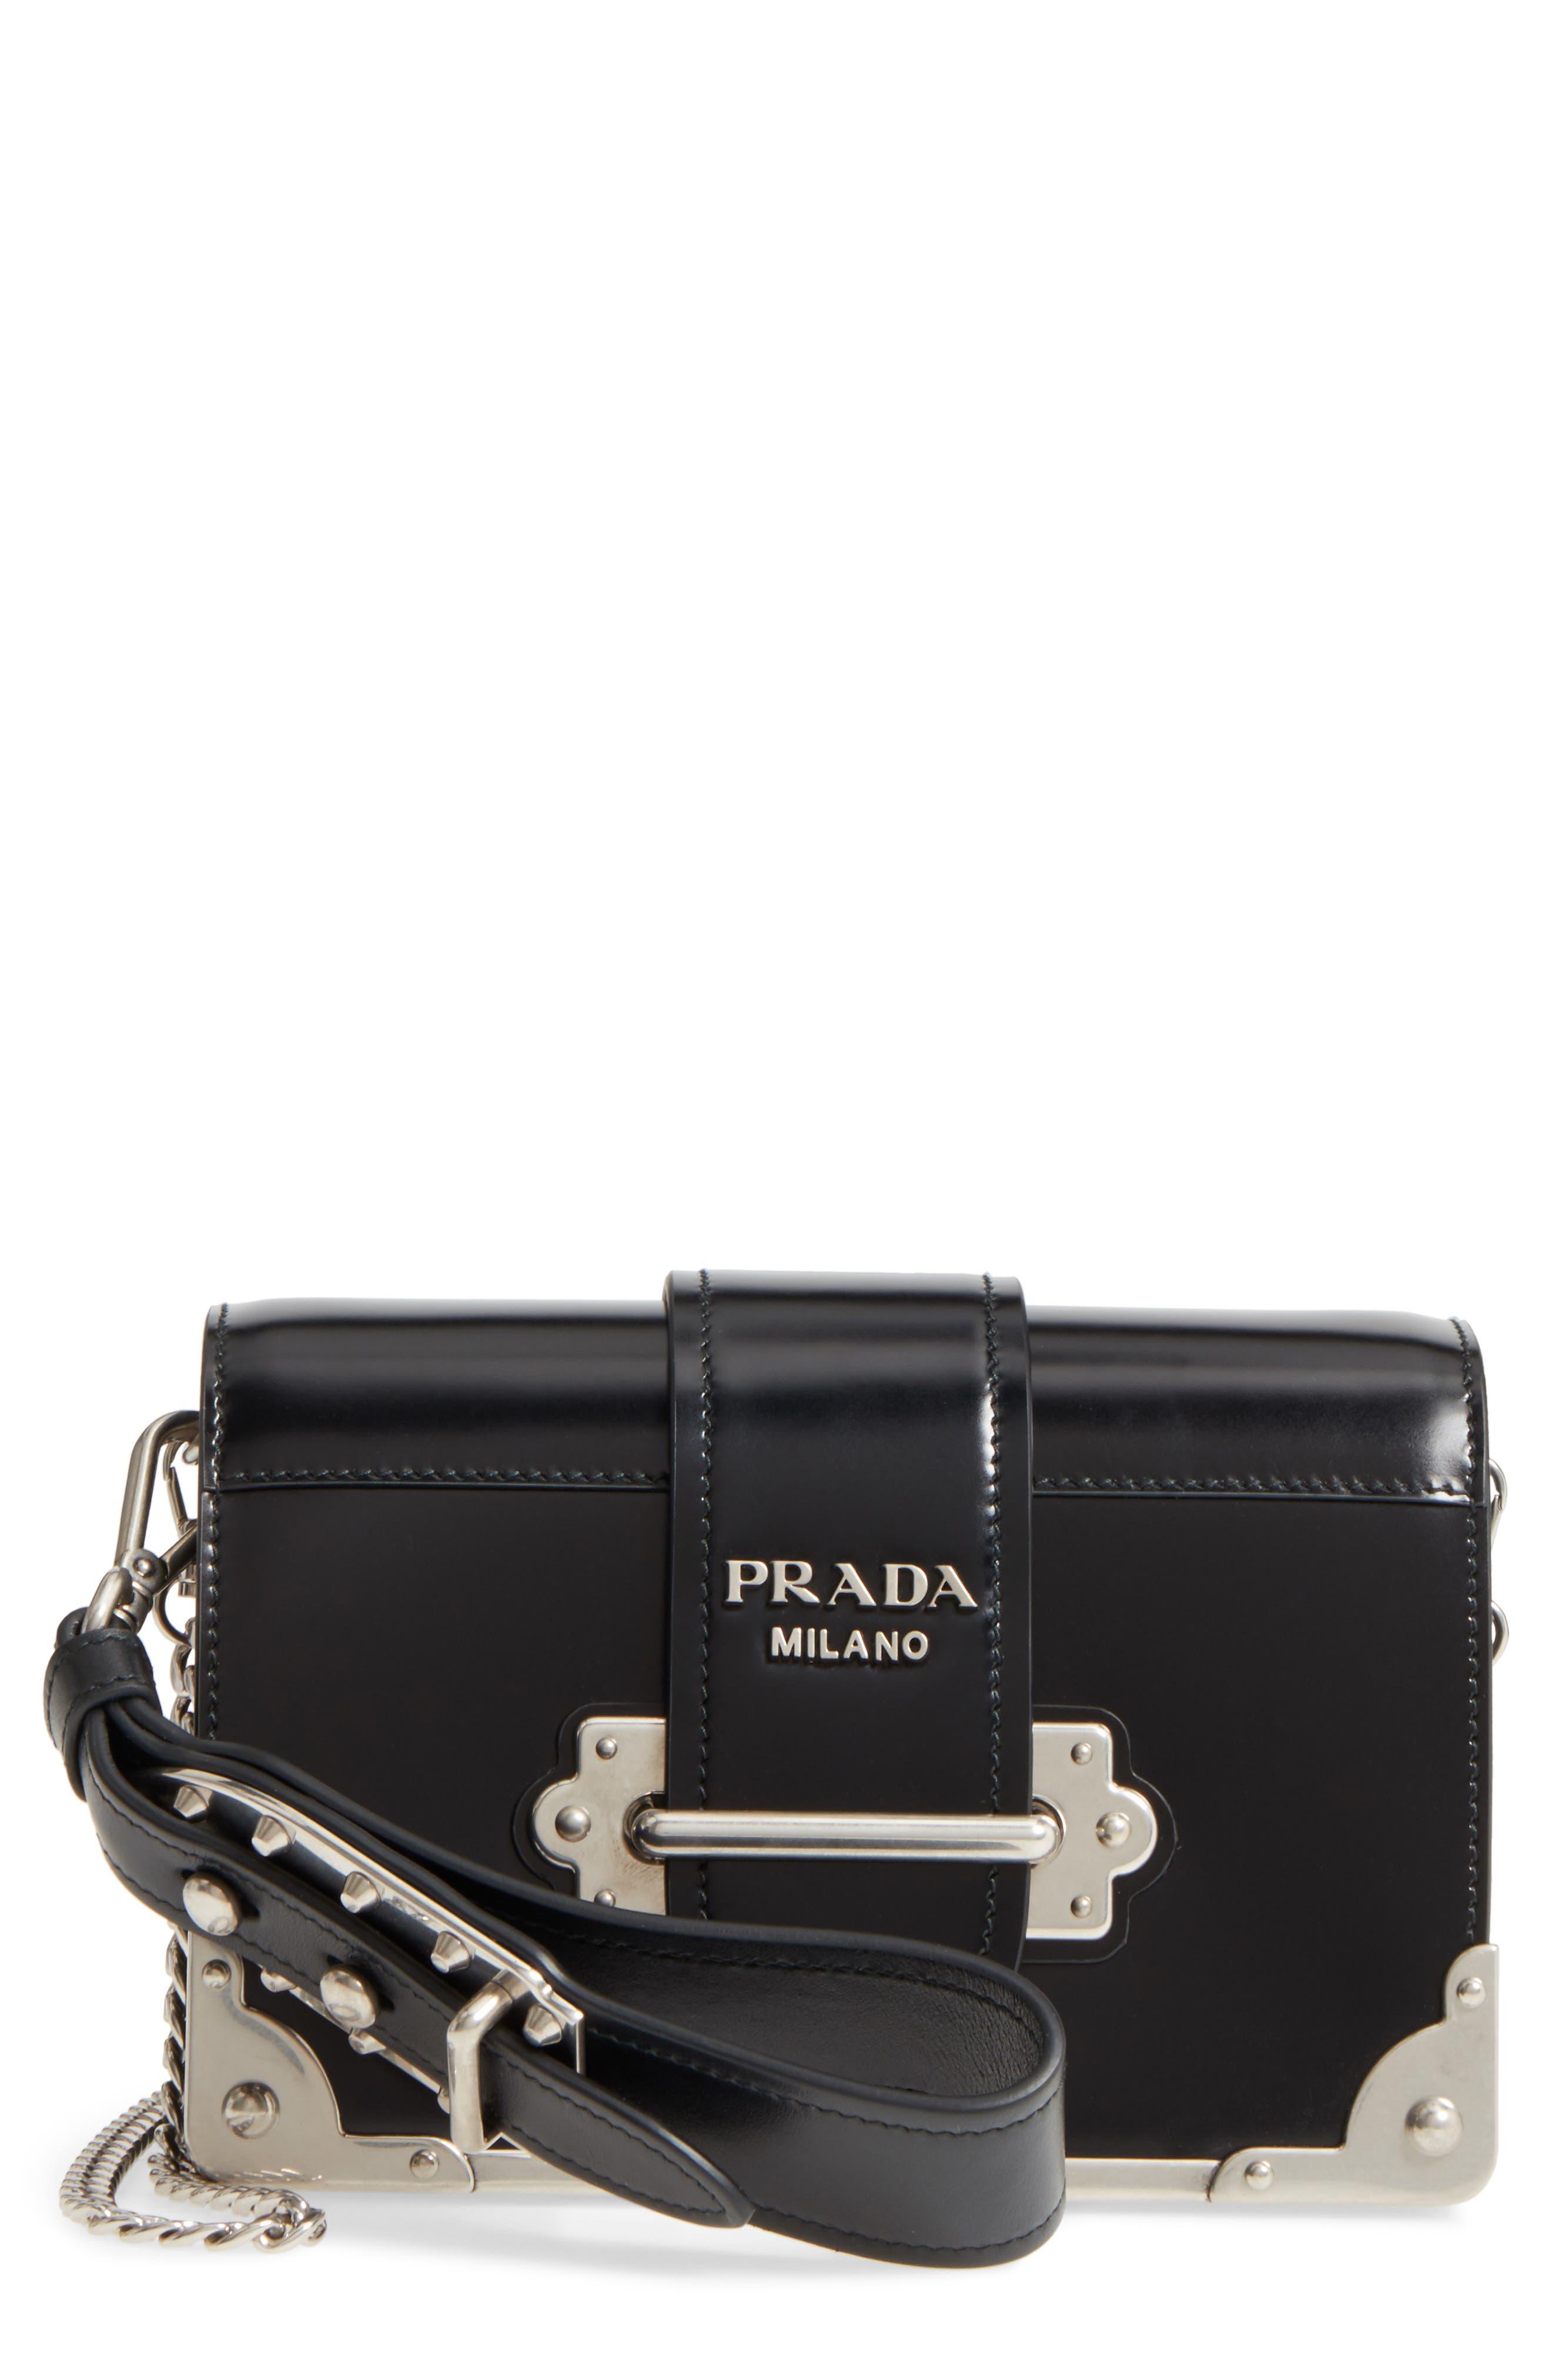 Main Image - Prada Small Cahier Leather Shoulder Bag